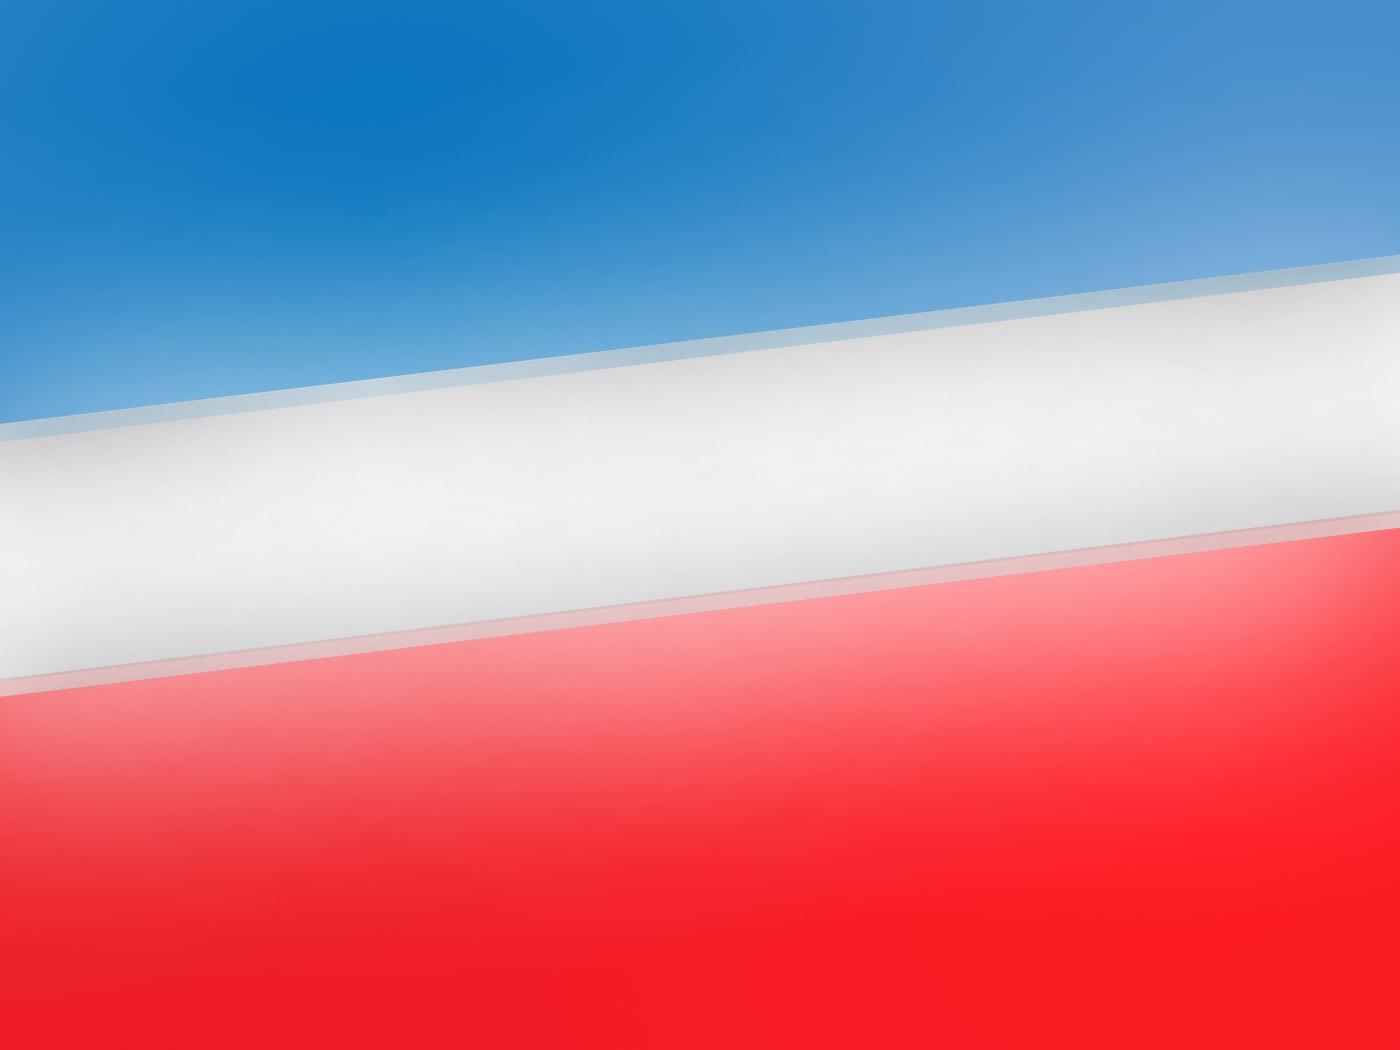 Red White and Blue WallpapersWallpaperSafari